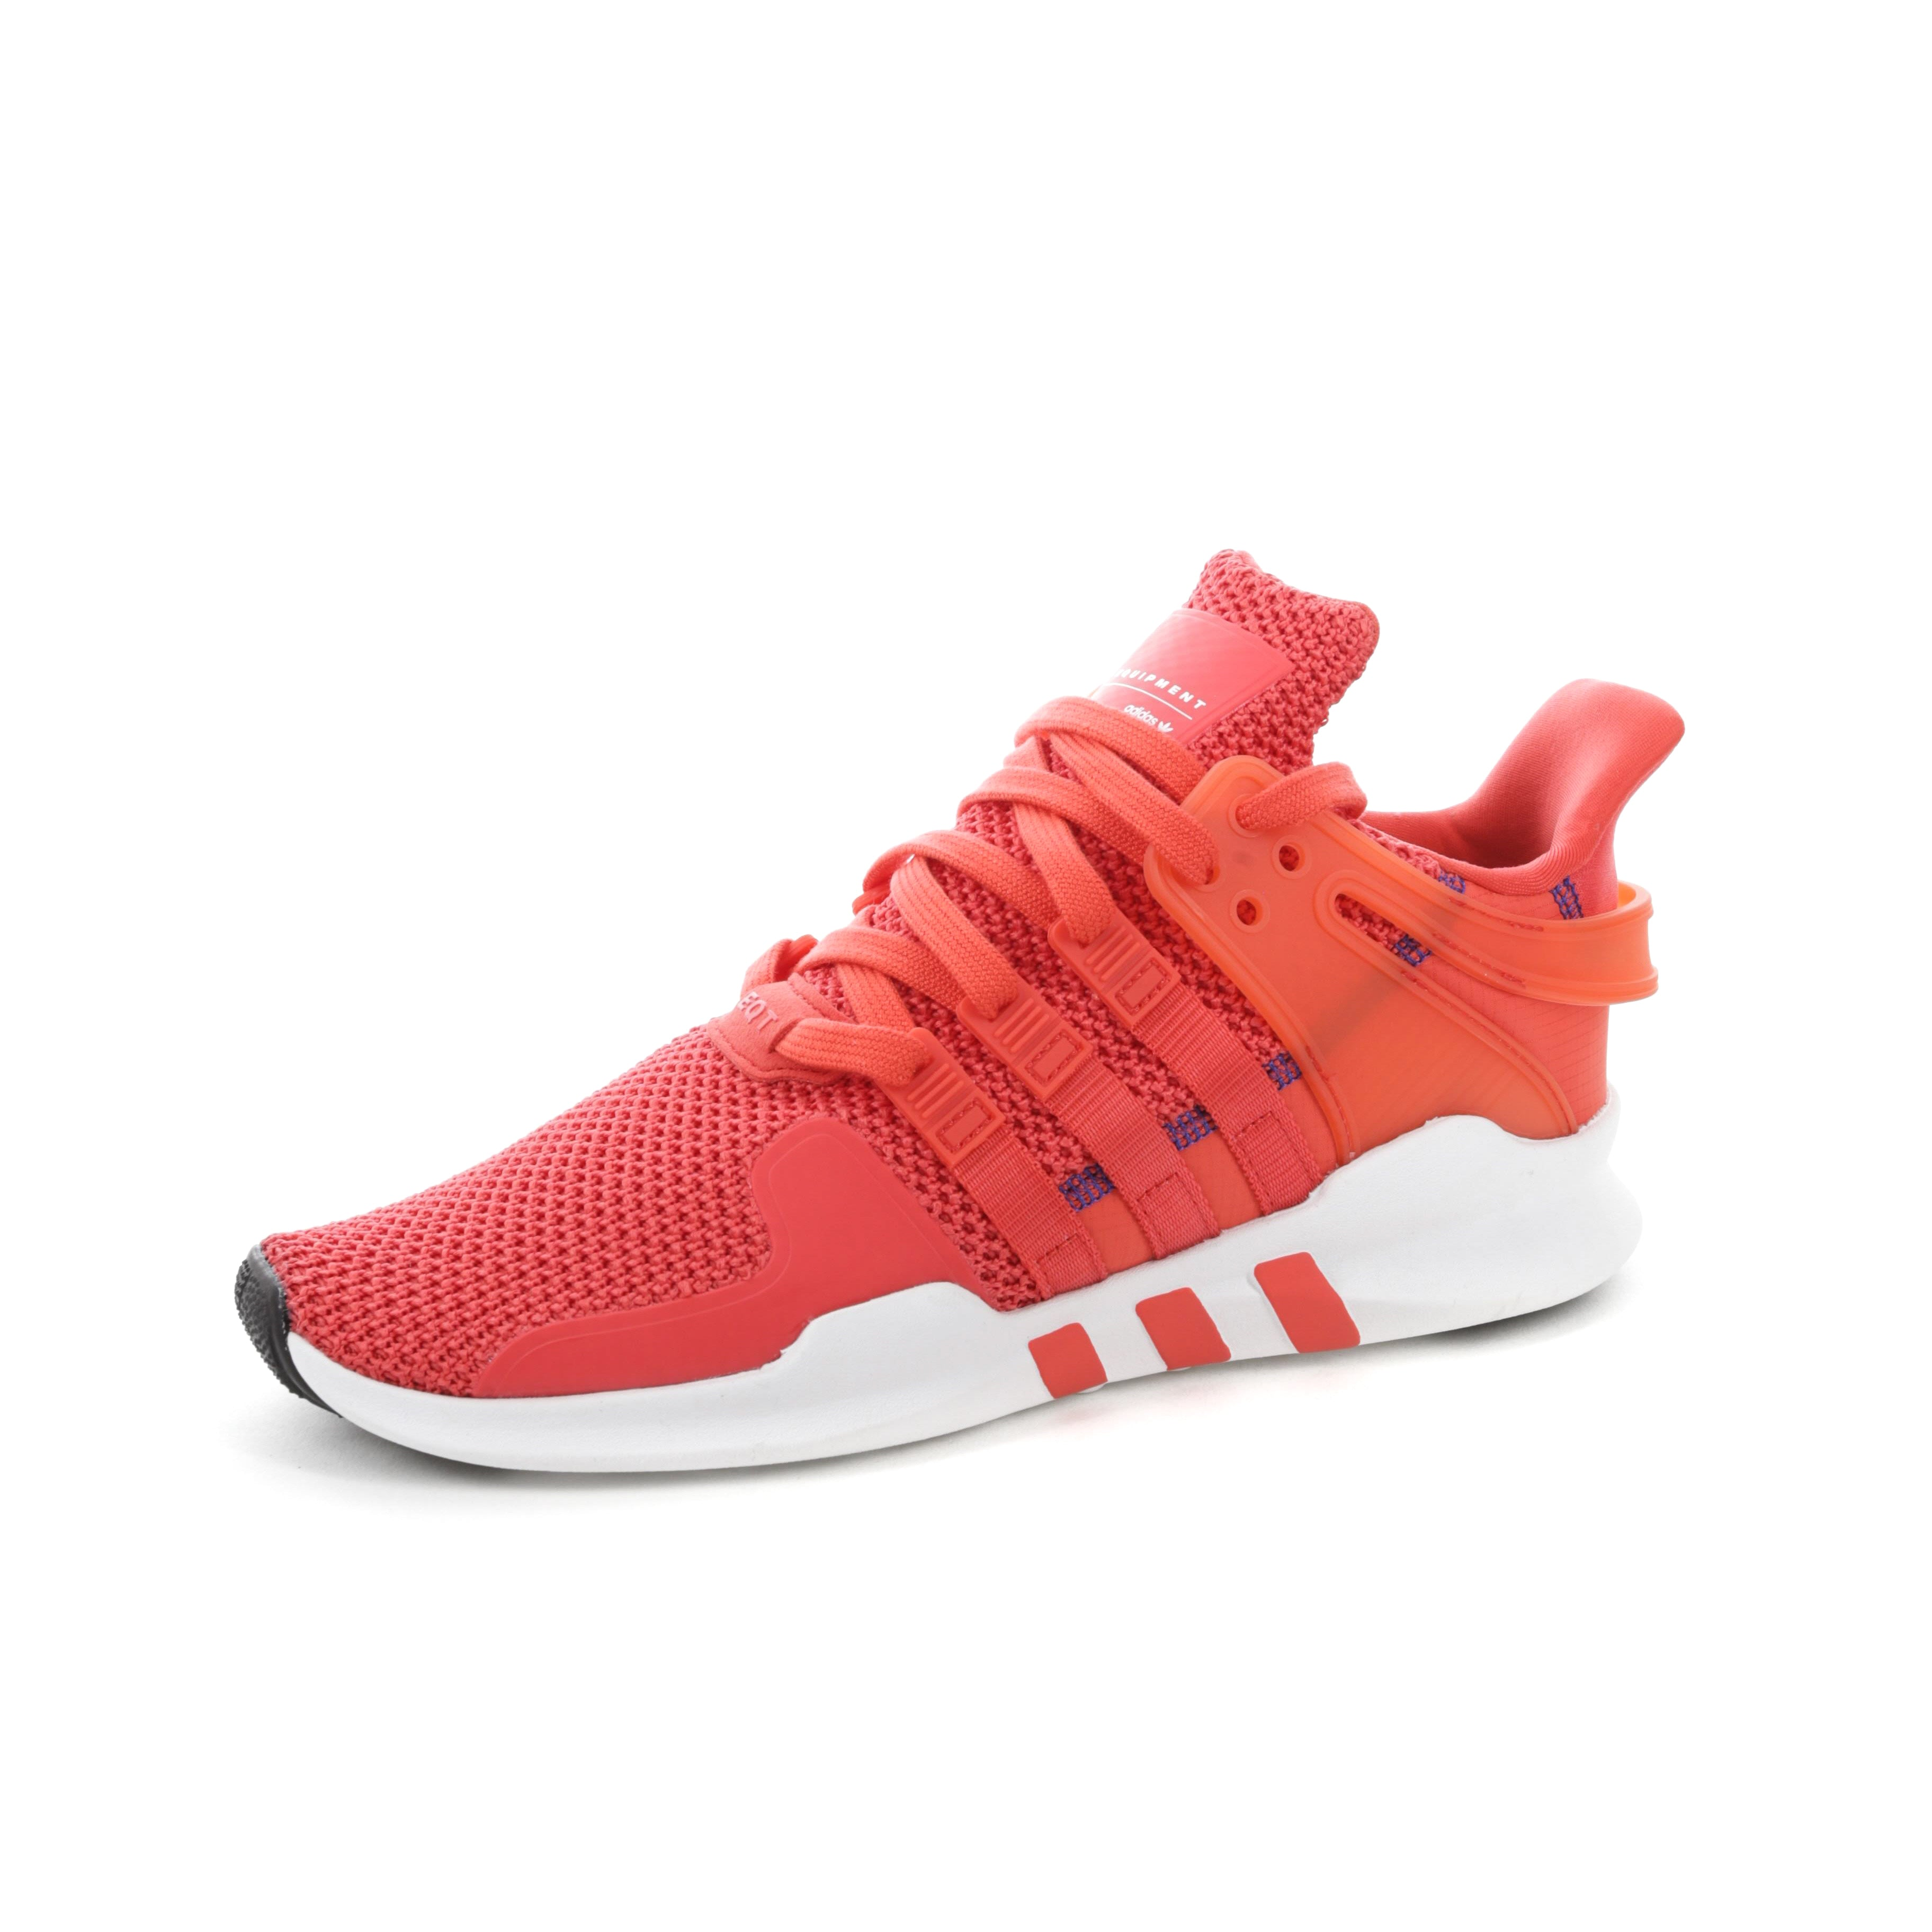 Adidas Originals EQT Support ADV RedWhite